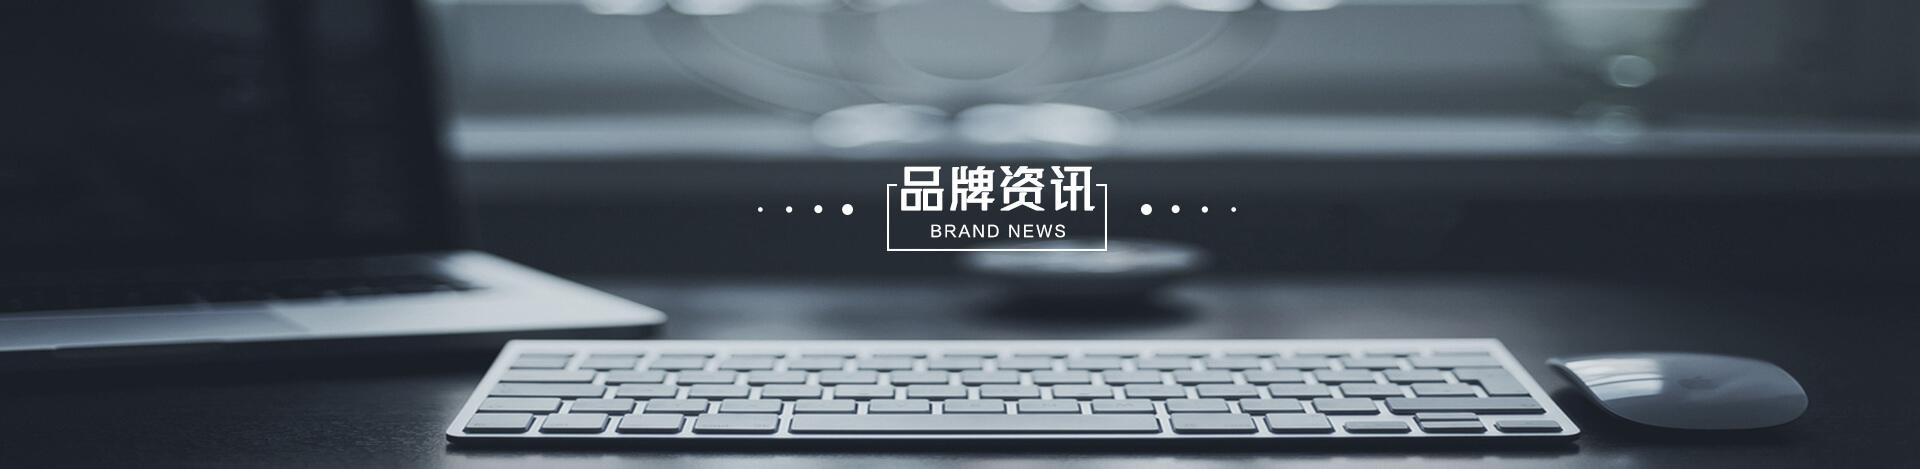 ManBetX安卓官网资讯